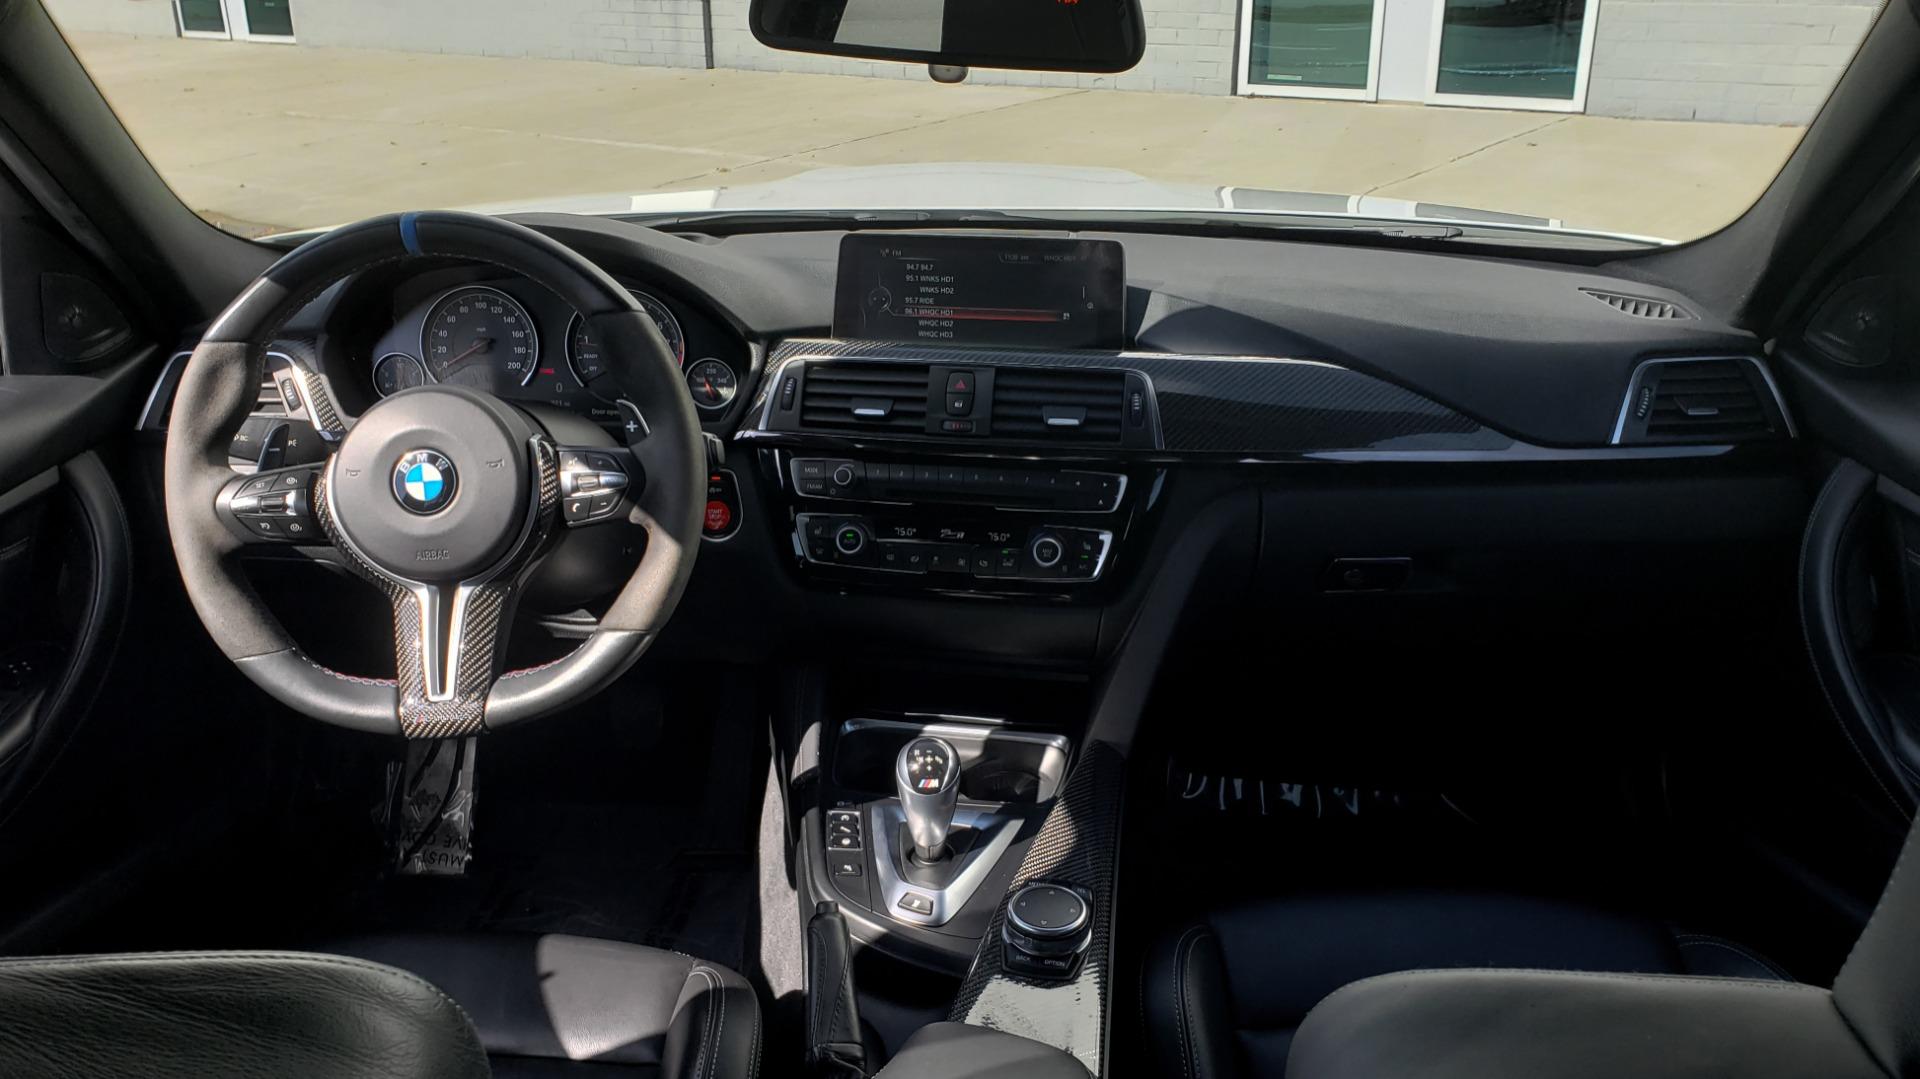 Used 2016 BMW M3 SEDAN / EXECUTIVE PKG / M-SUSPENSION / HARMAN/KARDON SOUND for sale Sold at Formula Imports in Charlotte NC 28227 77